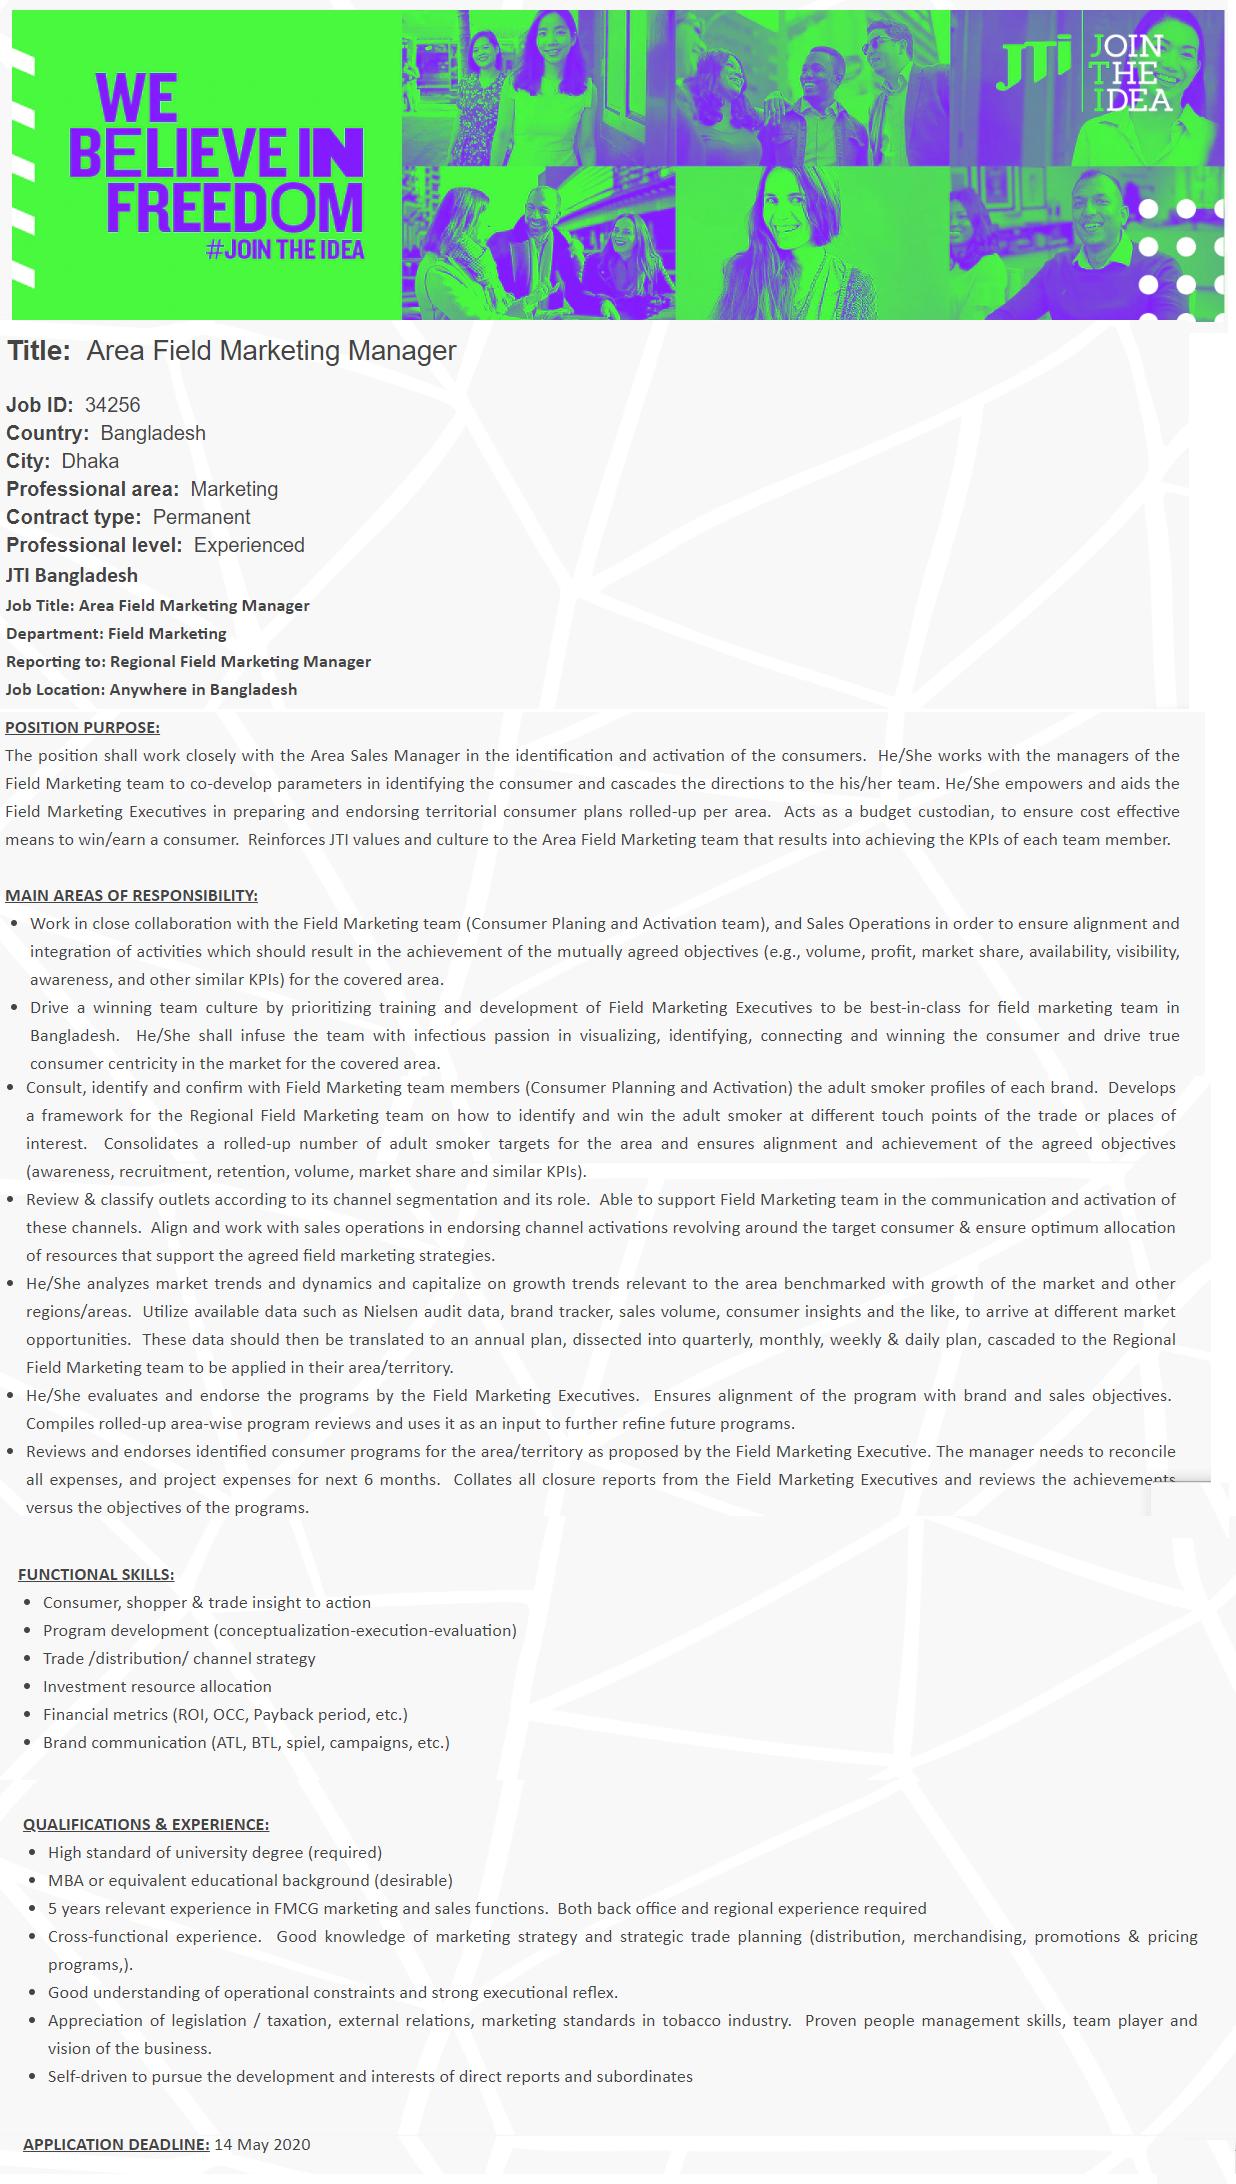 Japan Tobacco International (JTI) Job Circular 2020